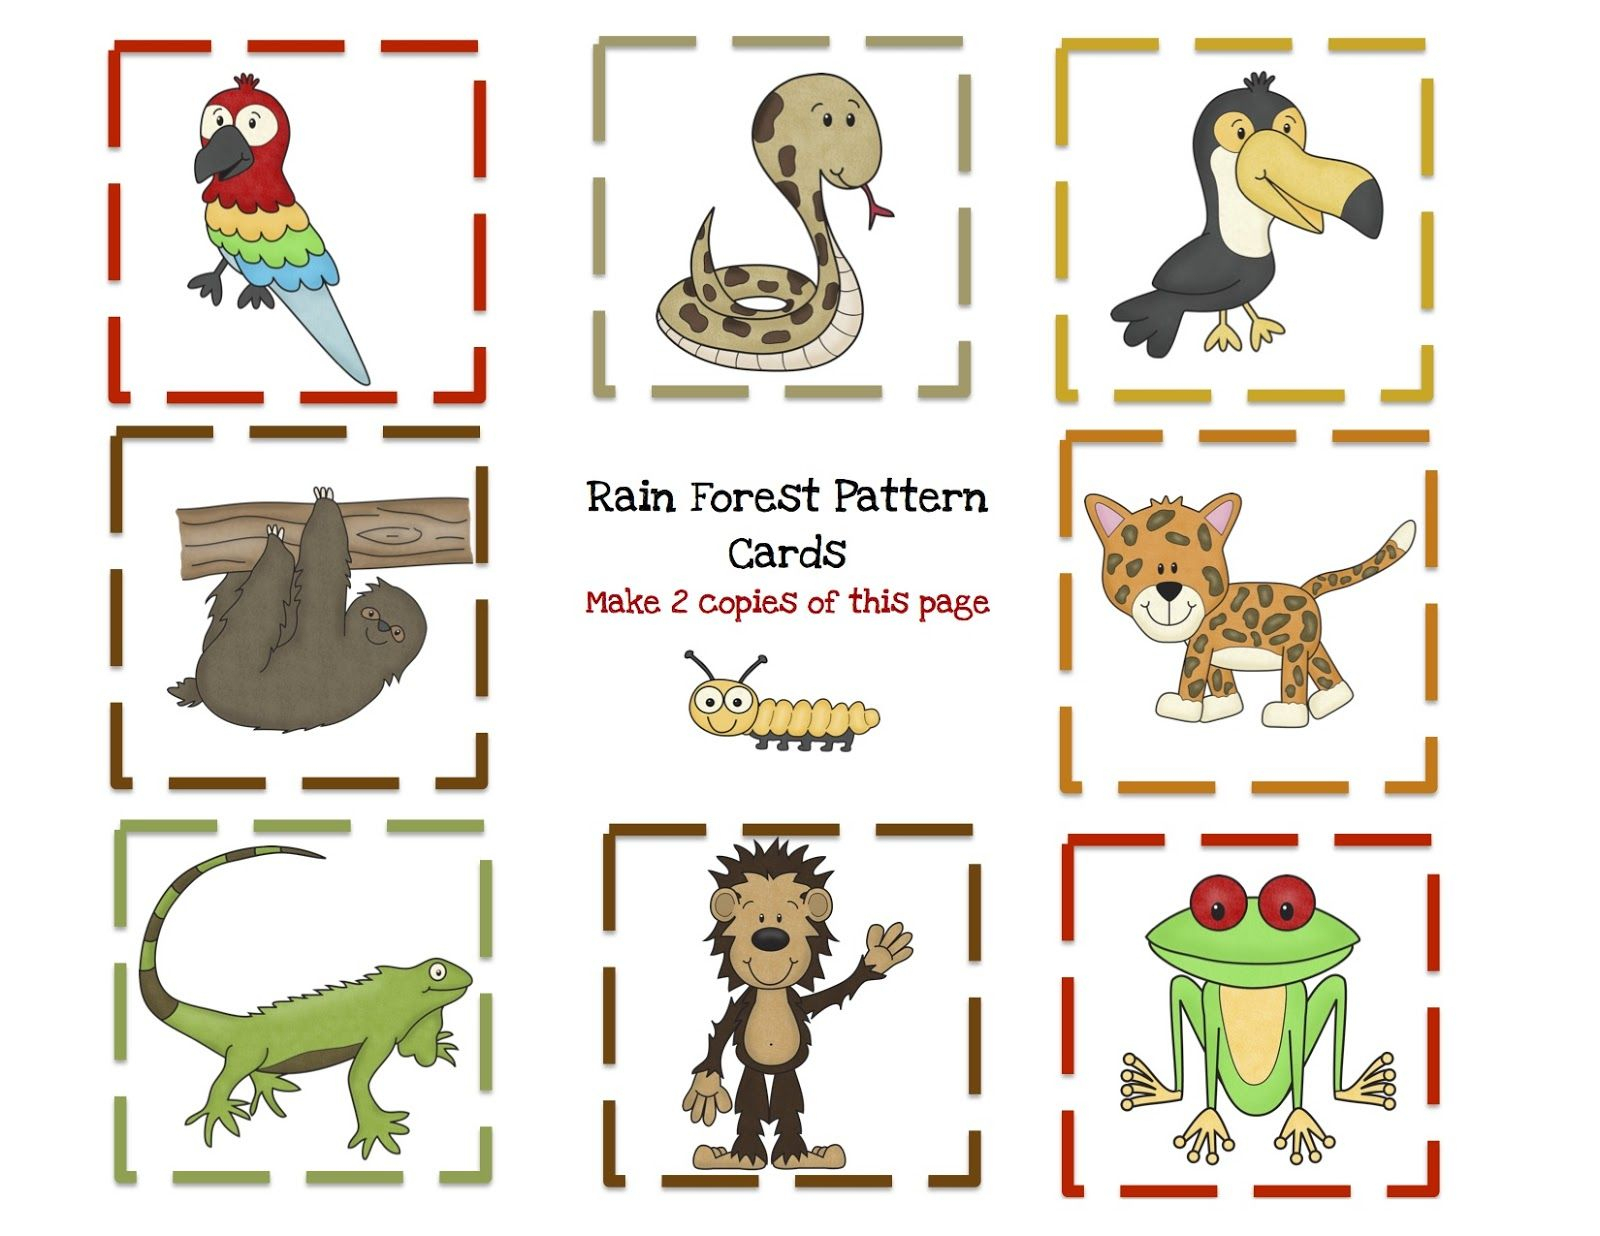 Preschool Printables: Rain Forest Animal Printable | Rain Forest | Rainforest Printable Worksheets